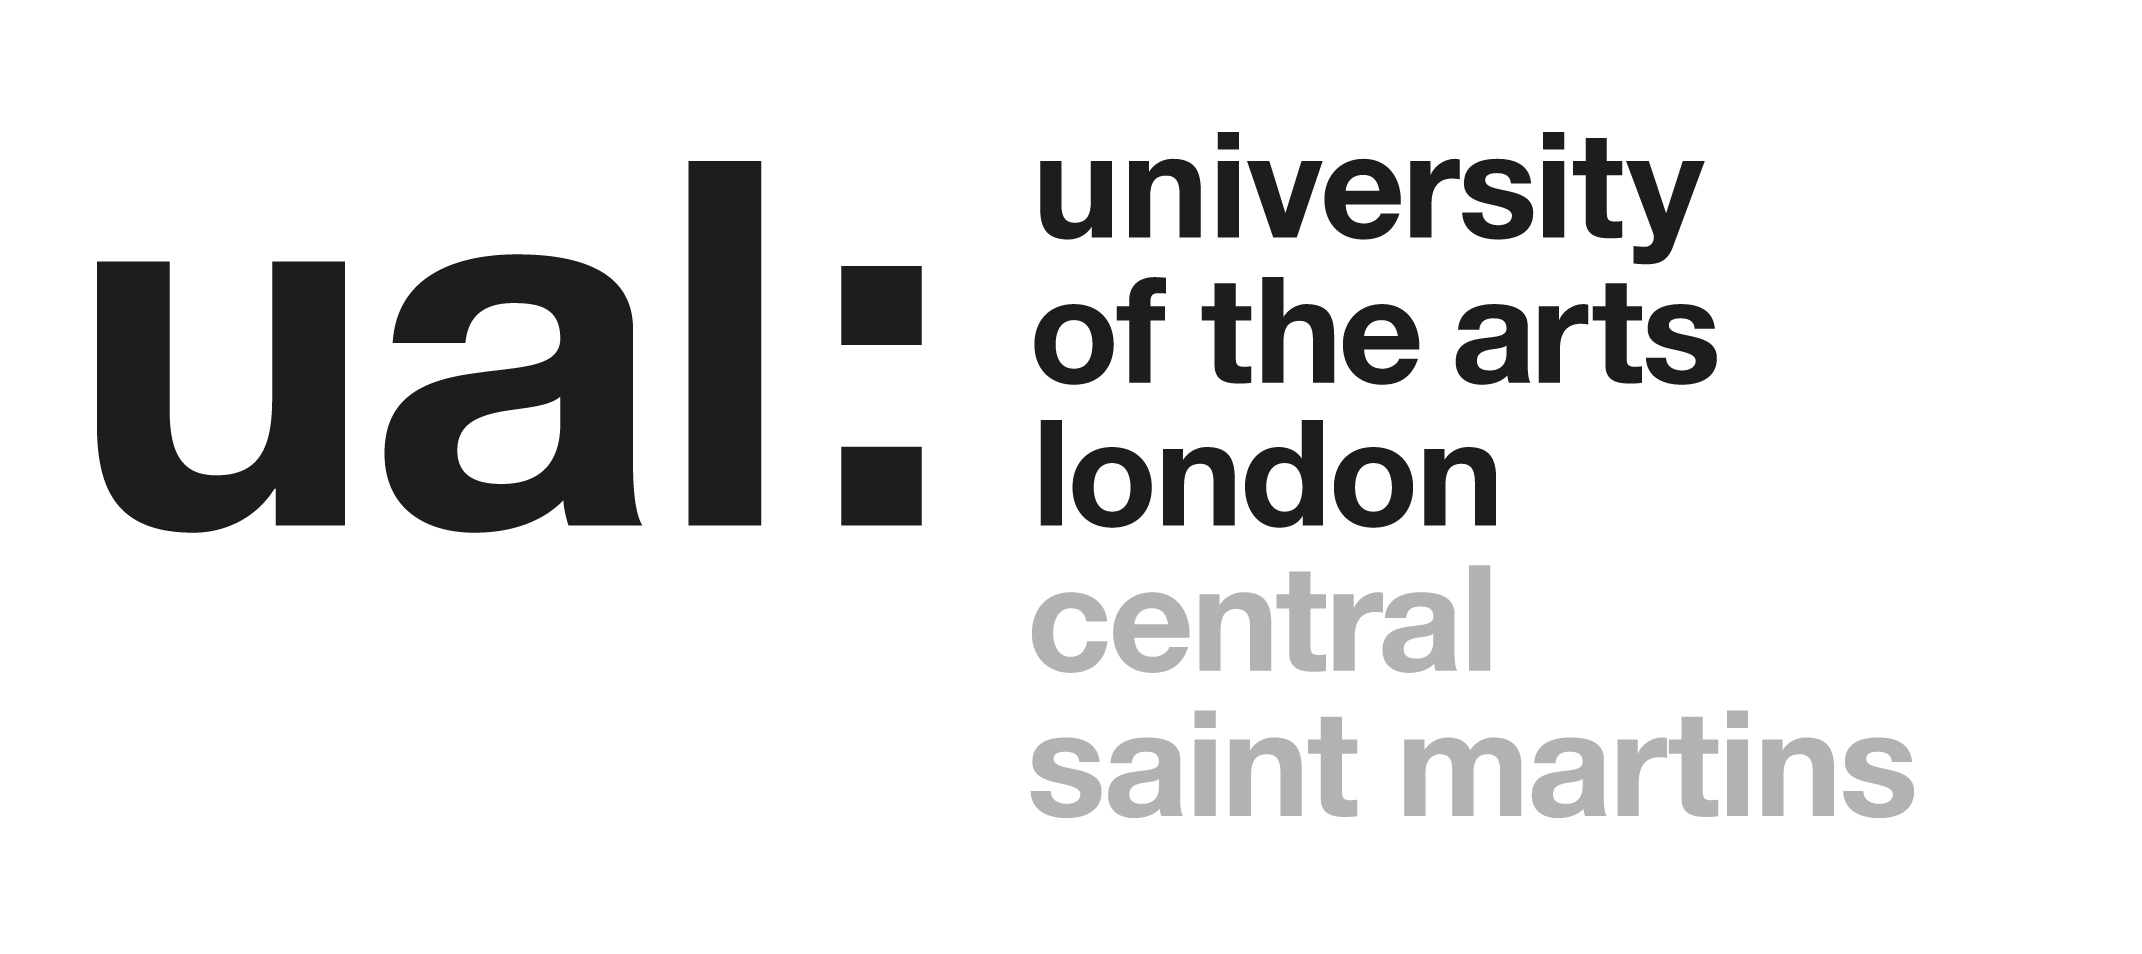 logo - Central Saint Martins AUL.jpg